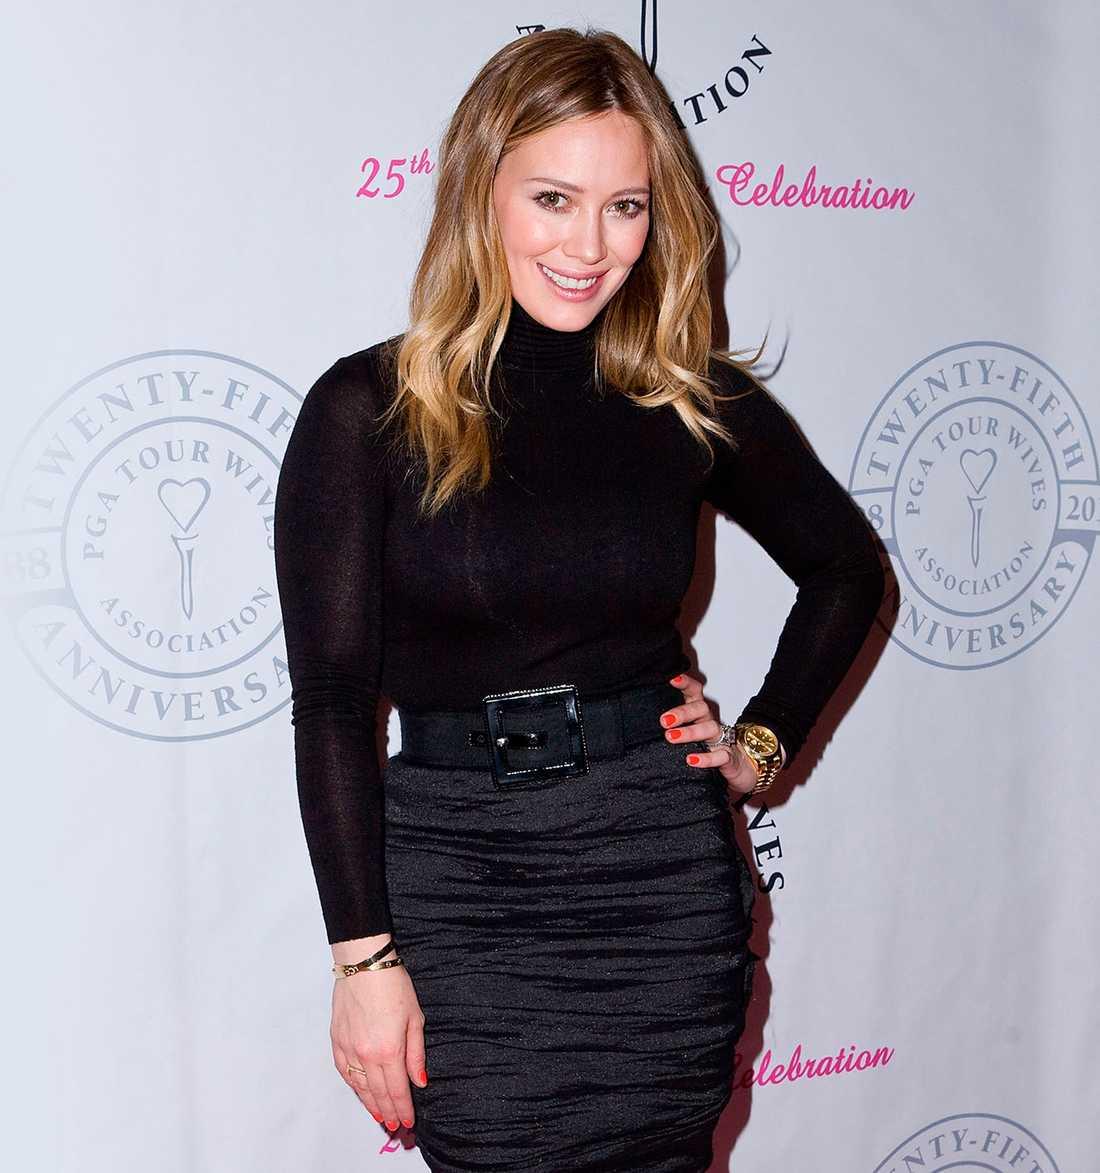 Hilary Duff på PGA-tourens Wives associations 25-års-jubileum i februari.